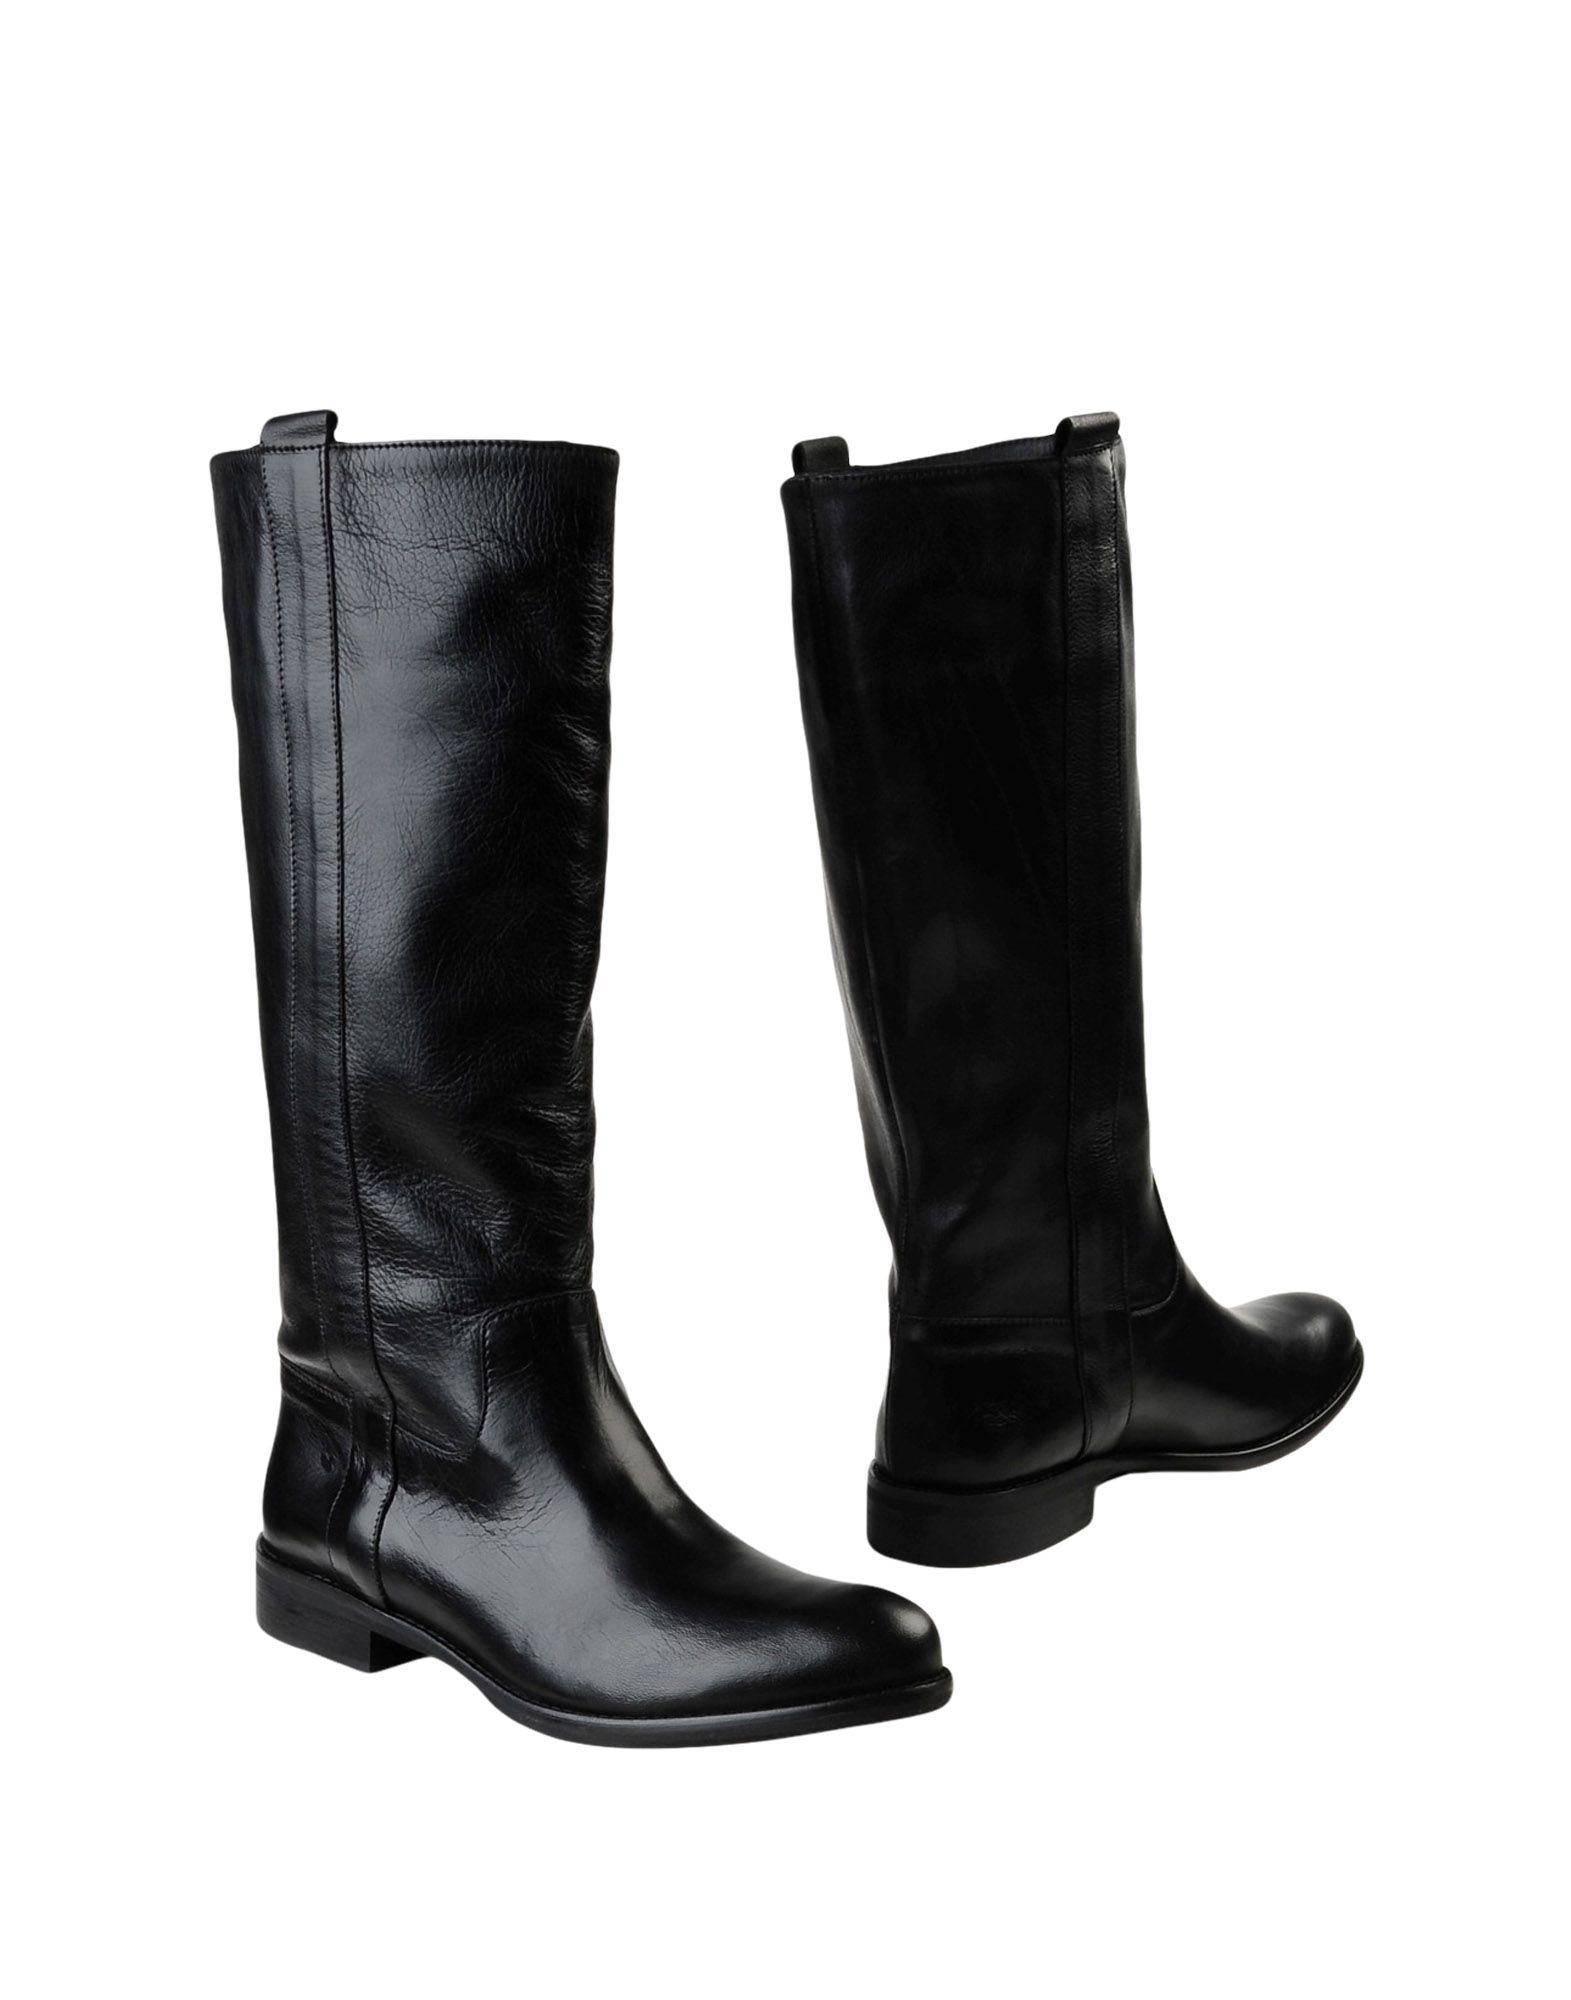 Leonardo Principi Stiefel Damen  11537602HHGut aussehende strapazierfähige Schuhe